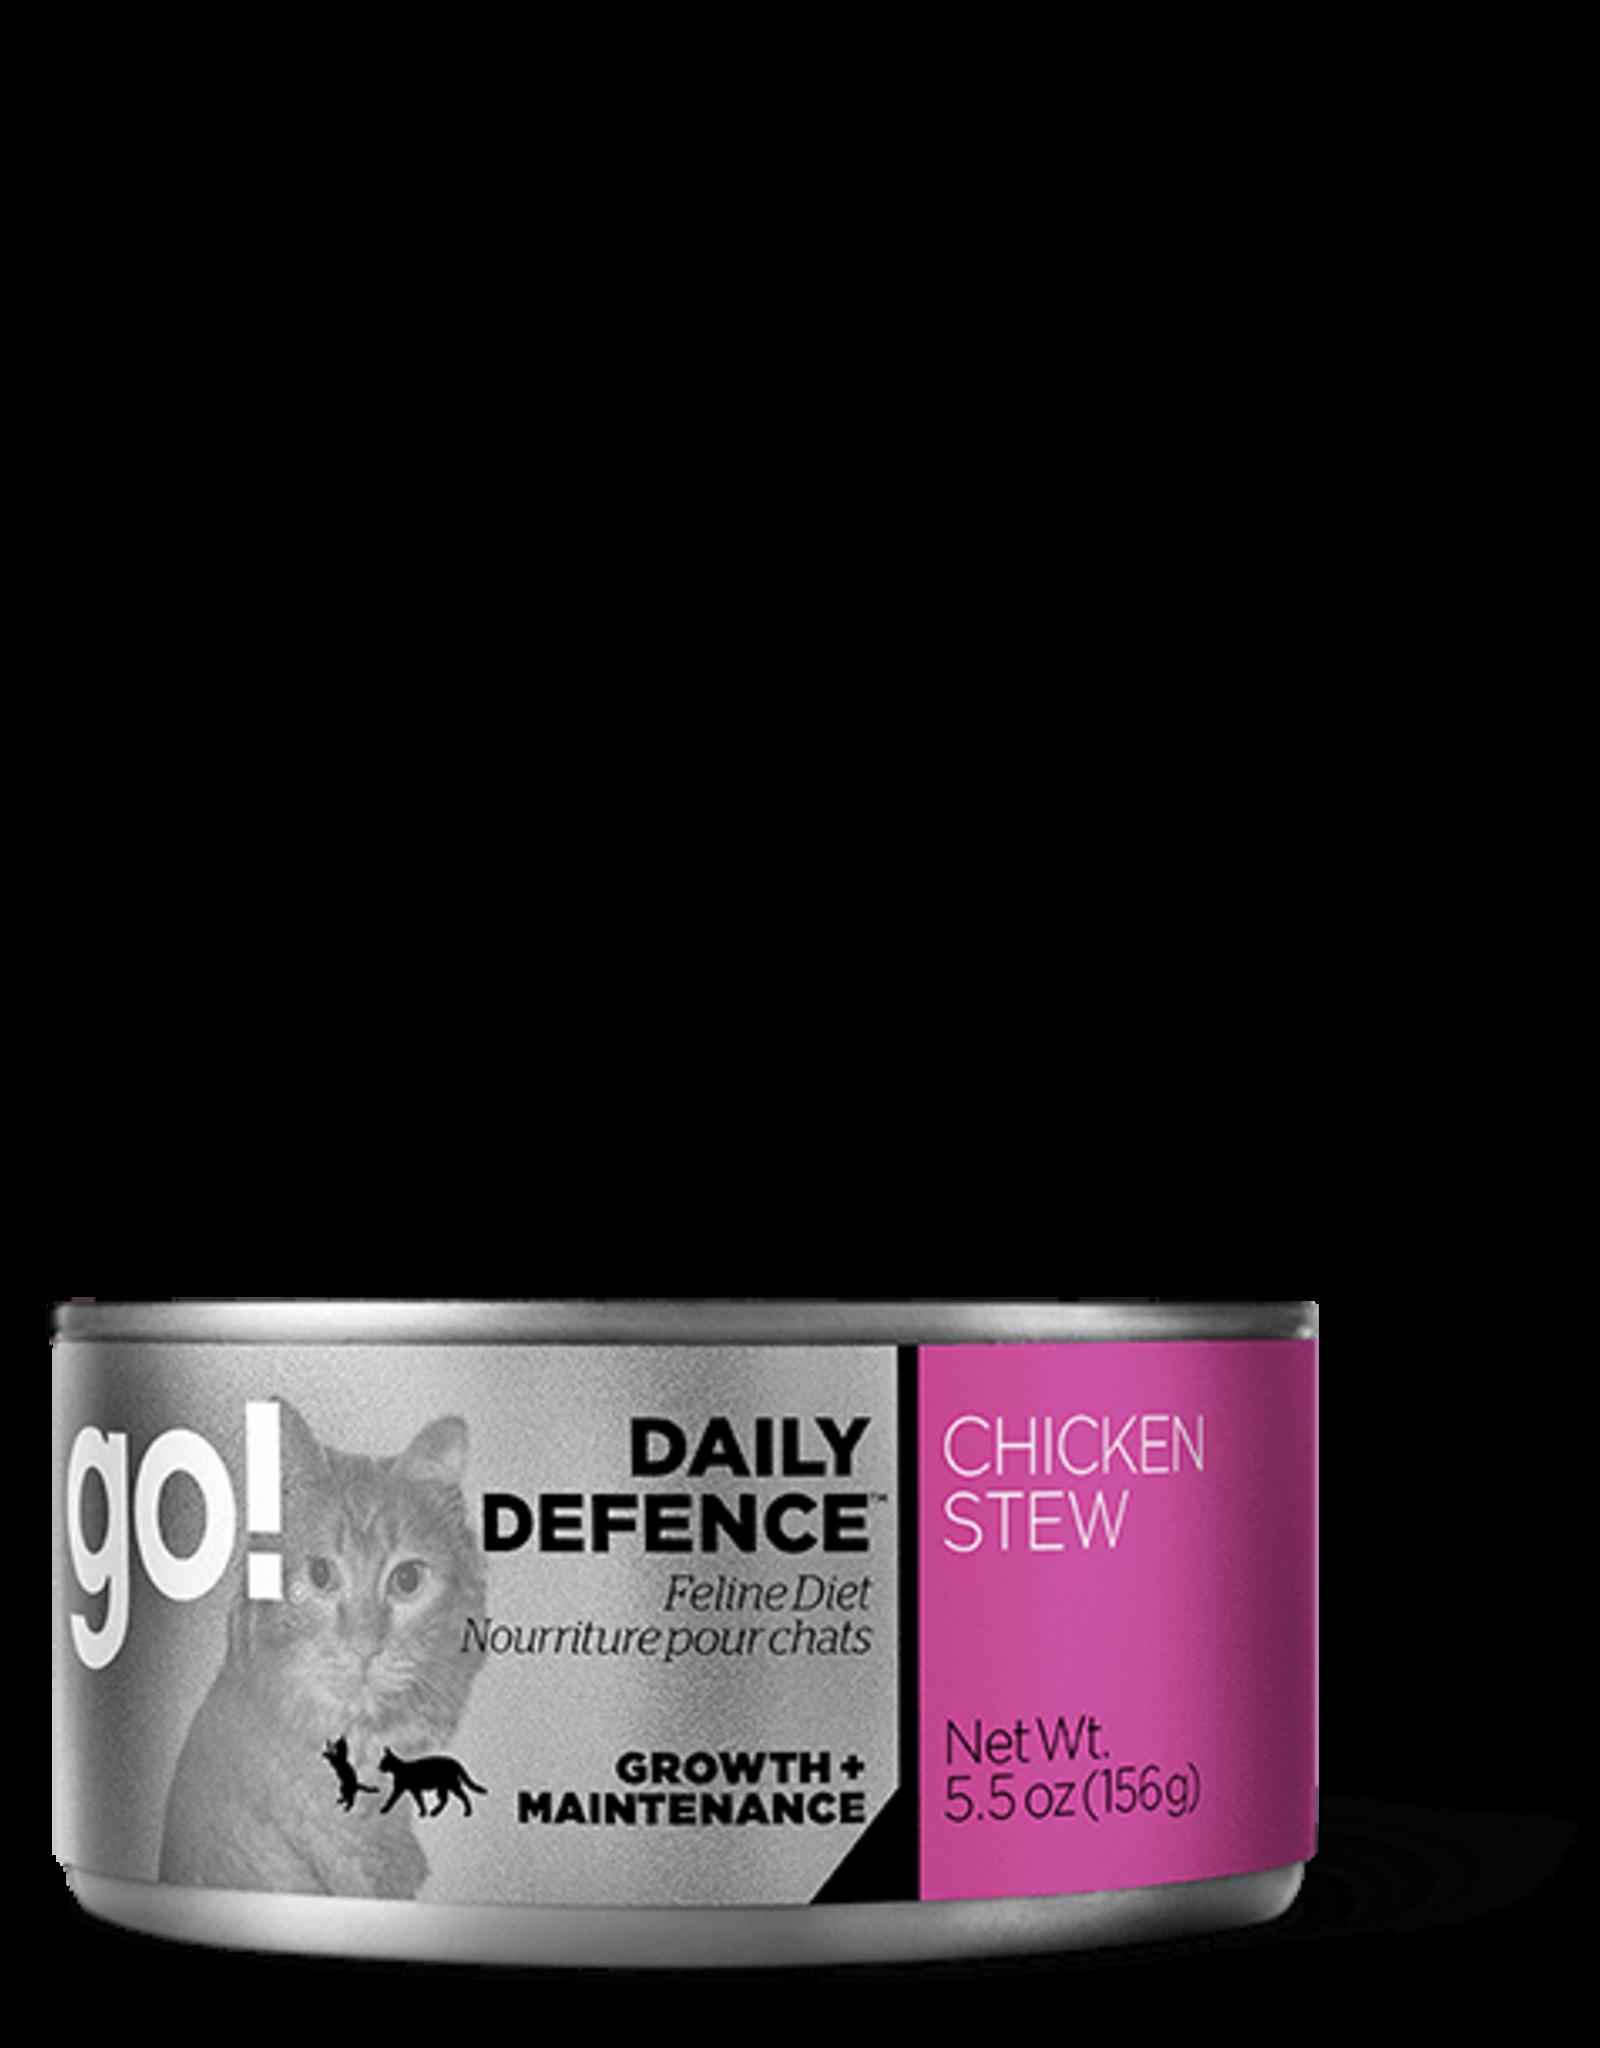 Go! Go! Cat Daily Defence Chicken Stew 5.5oz